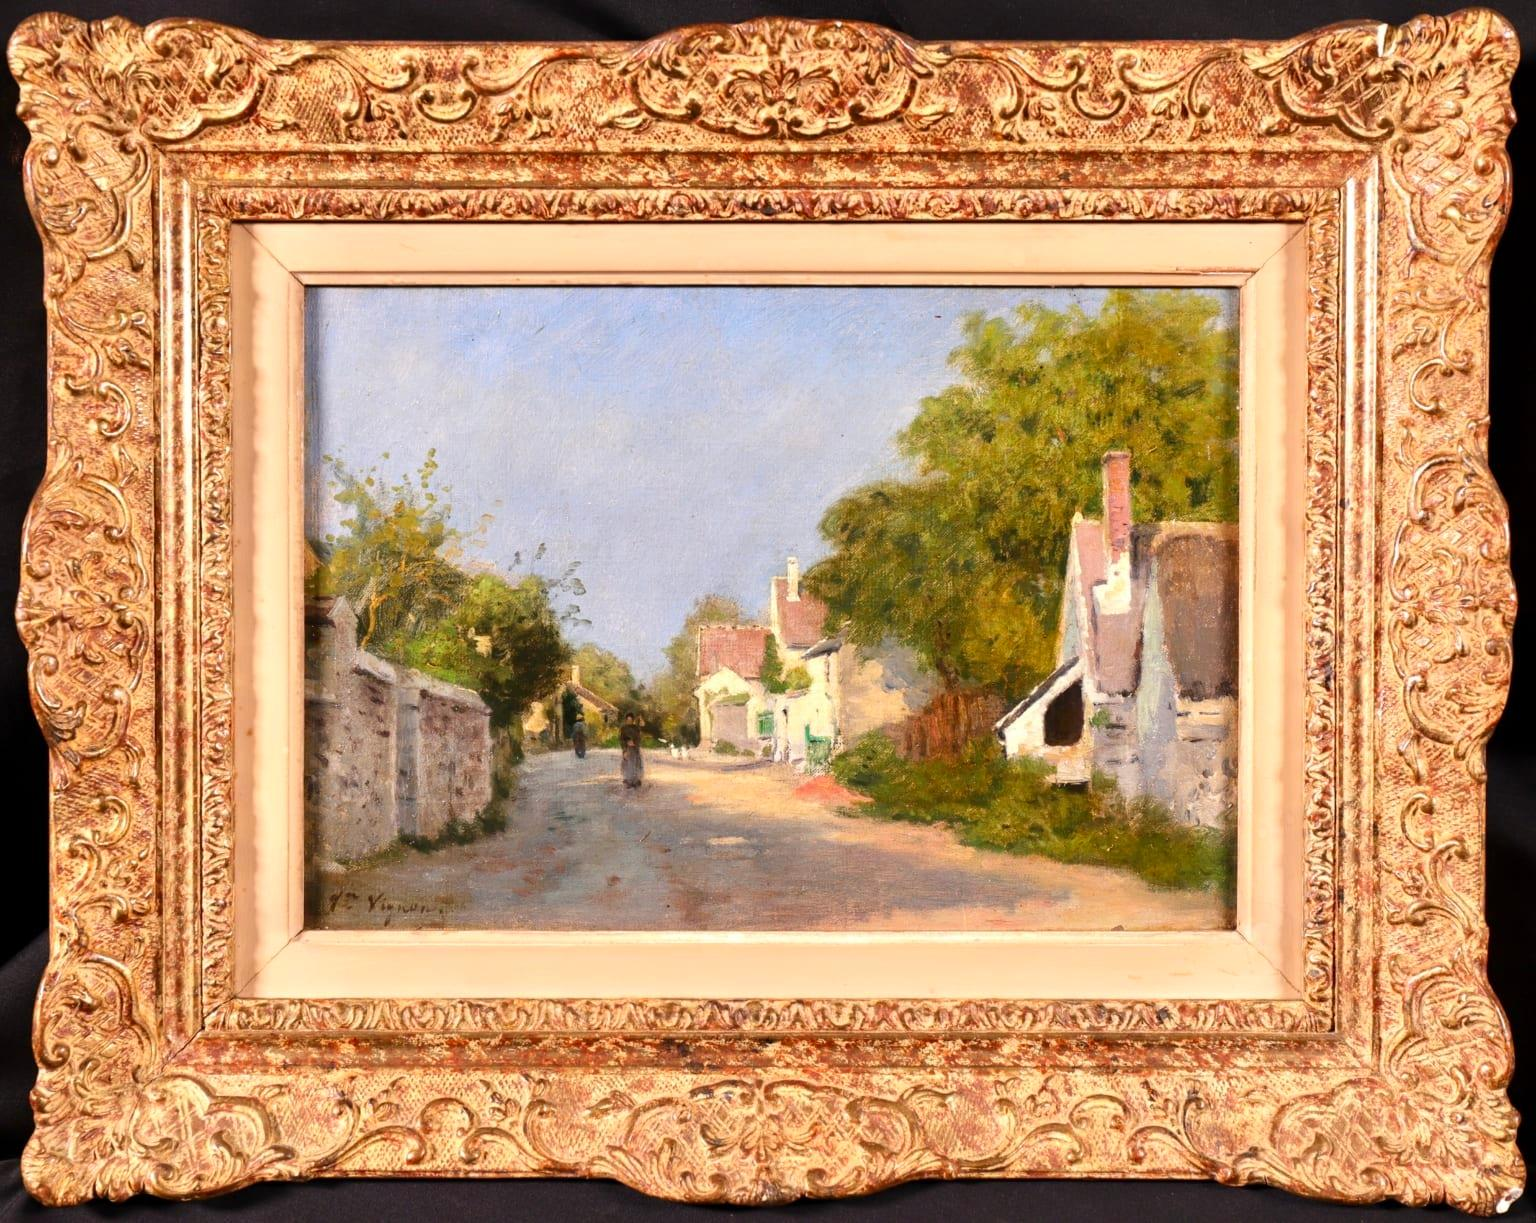 Figures in a Village Street - Impressionist Oil, Landscape by Victor Vignon